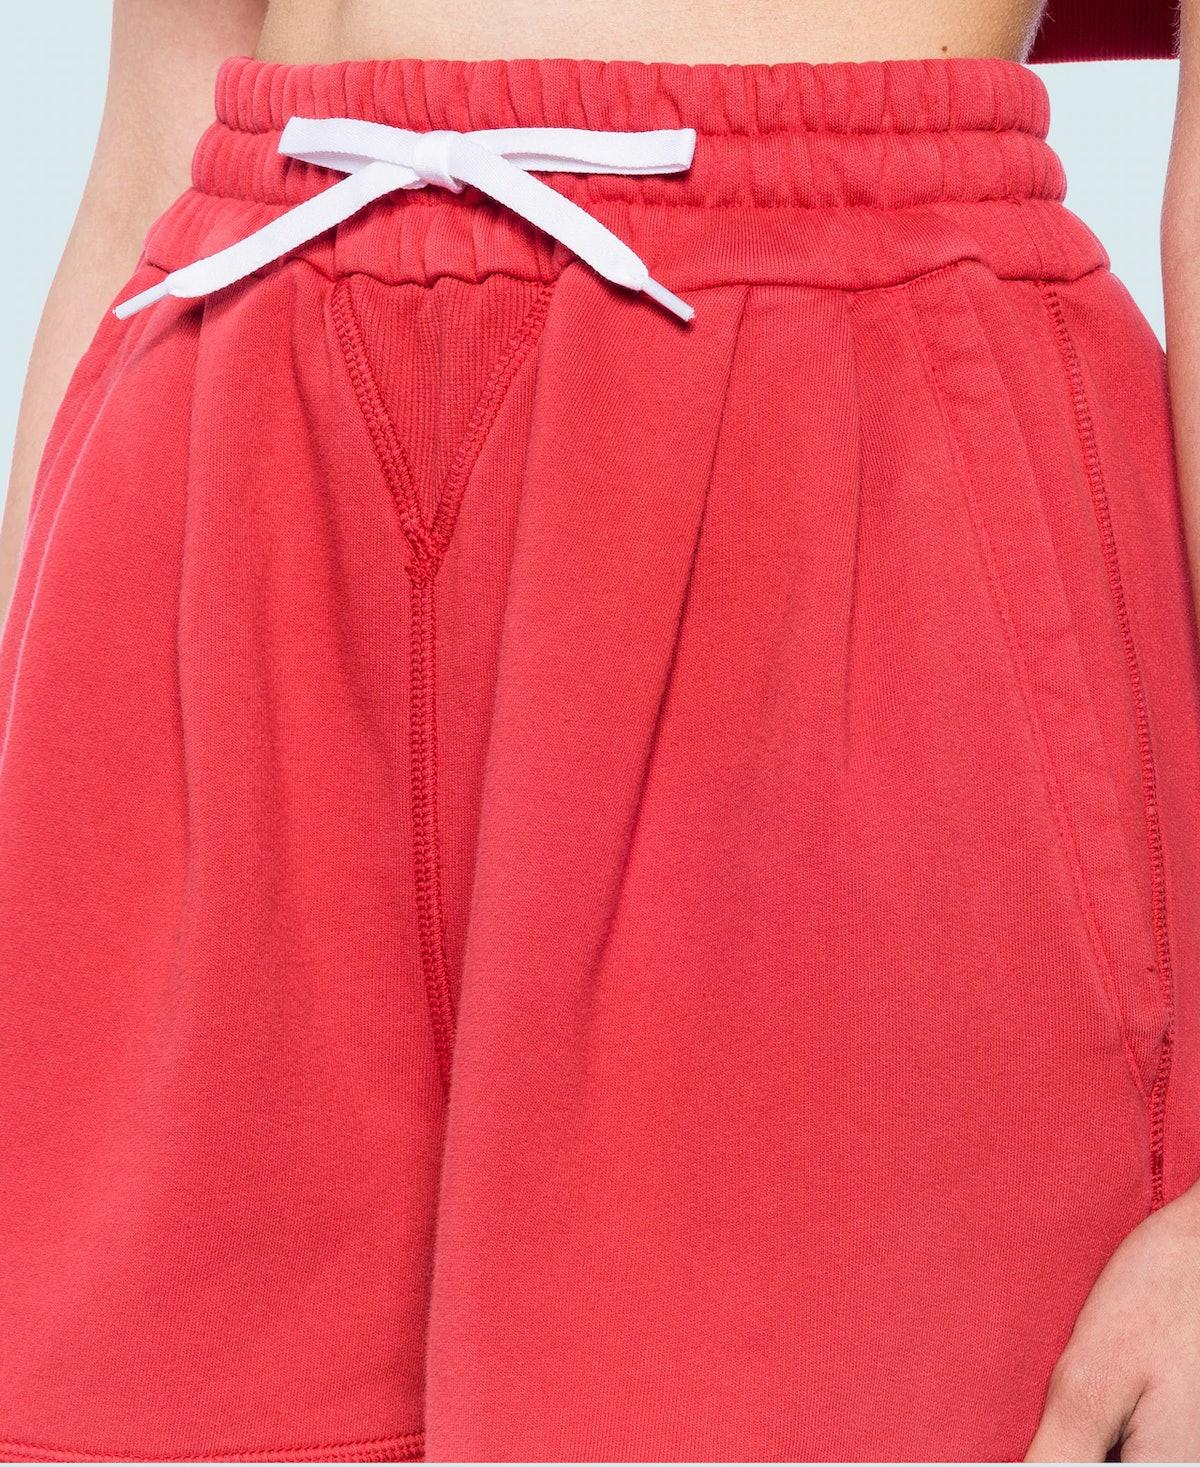 Cotton Fleece Garment-Dyed Shorts